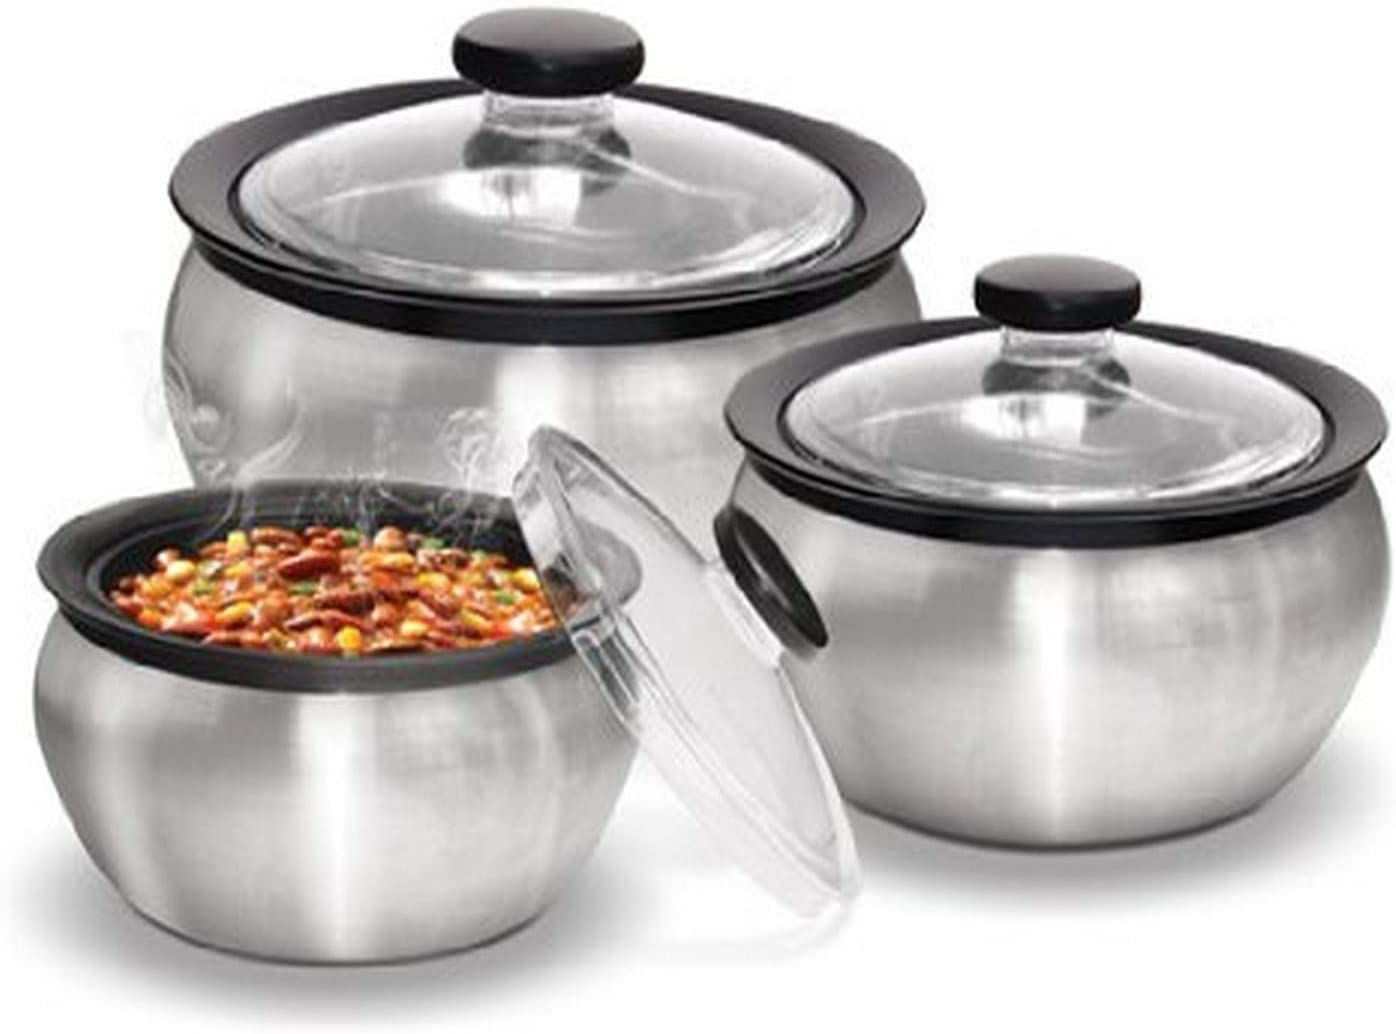 Milton 600/1500/2000ml 3-Piece Thermo Hot-Pot Insulated Casserole Gift Set, Medium, Steel